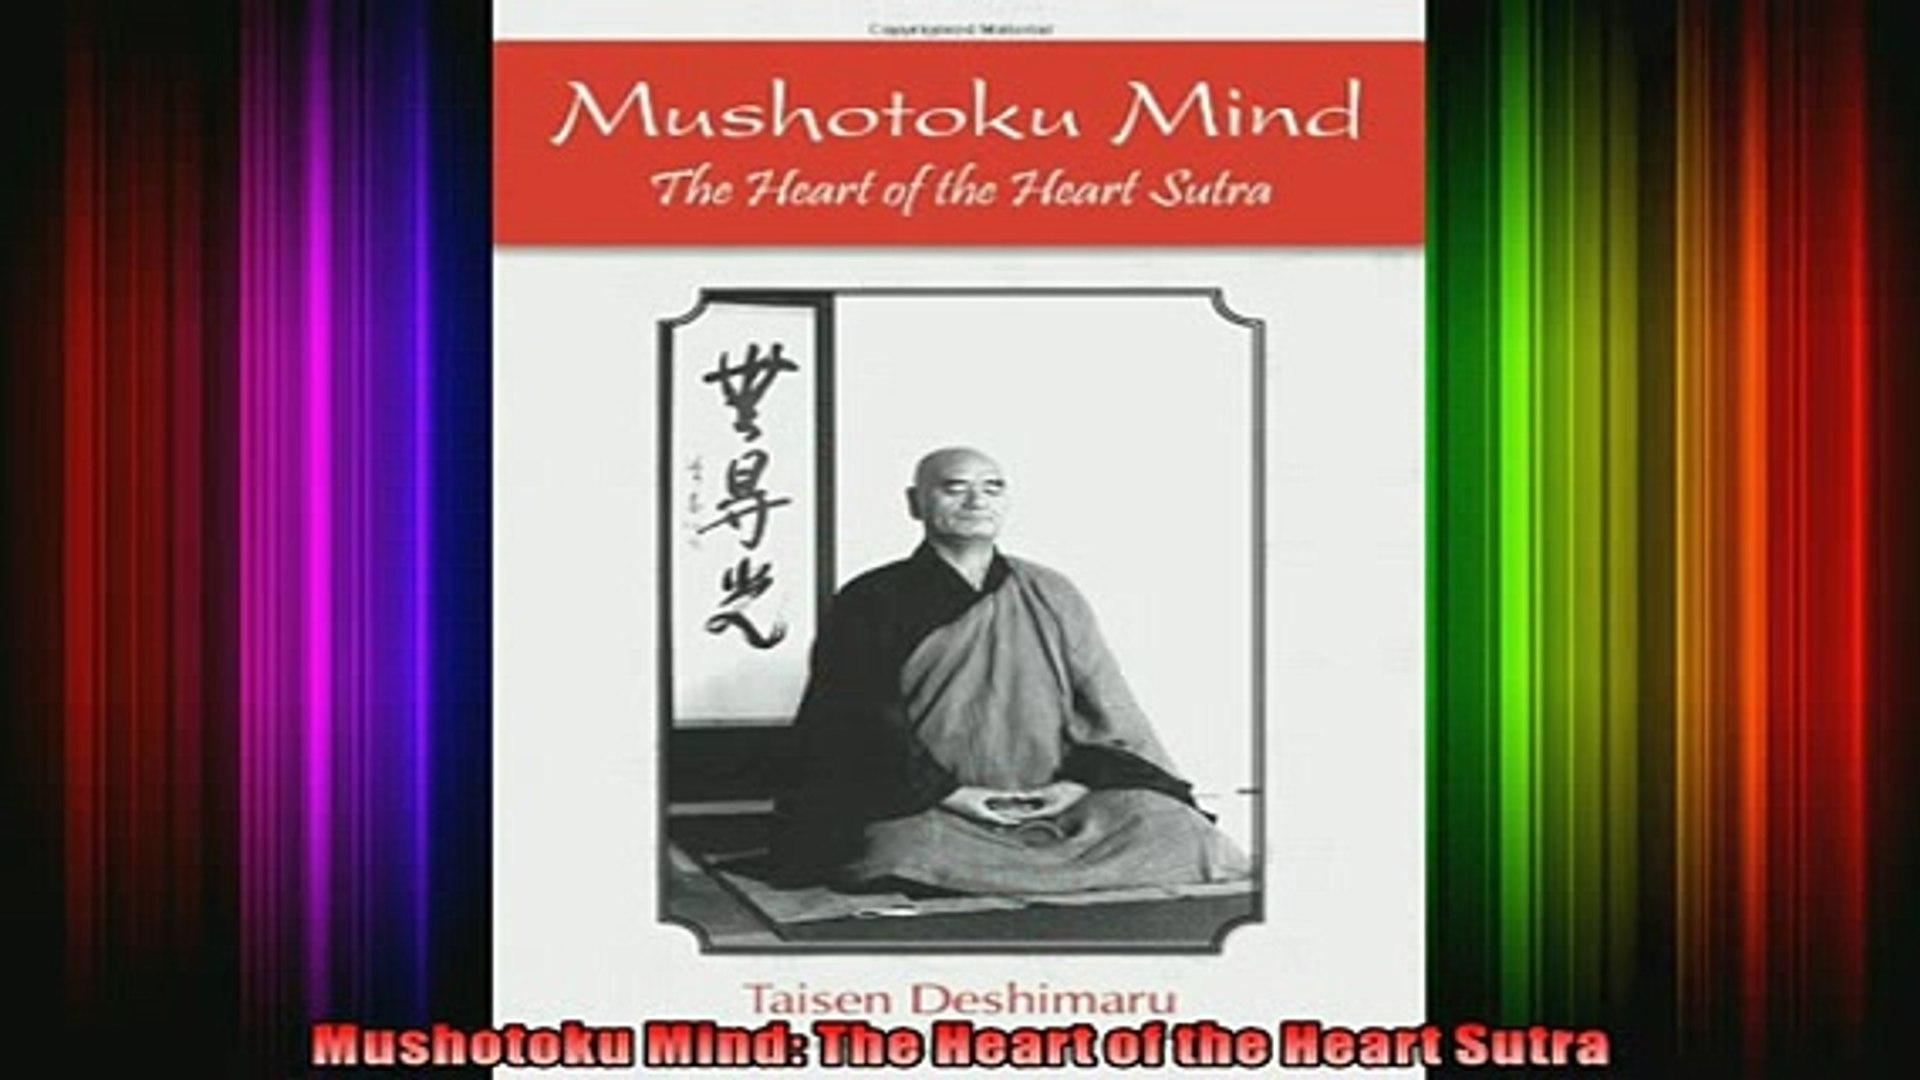 Mushotoku Mind